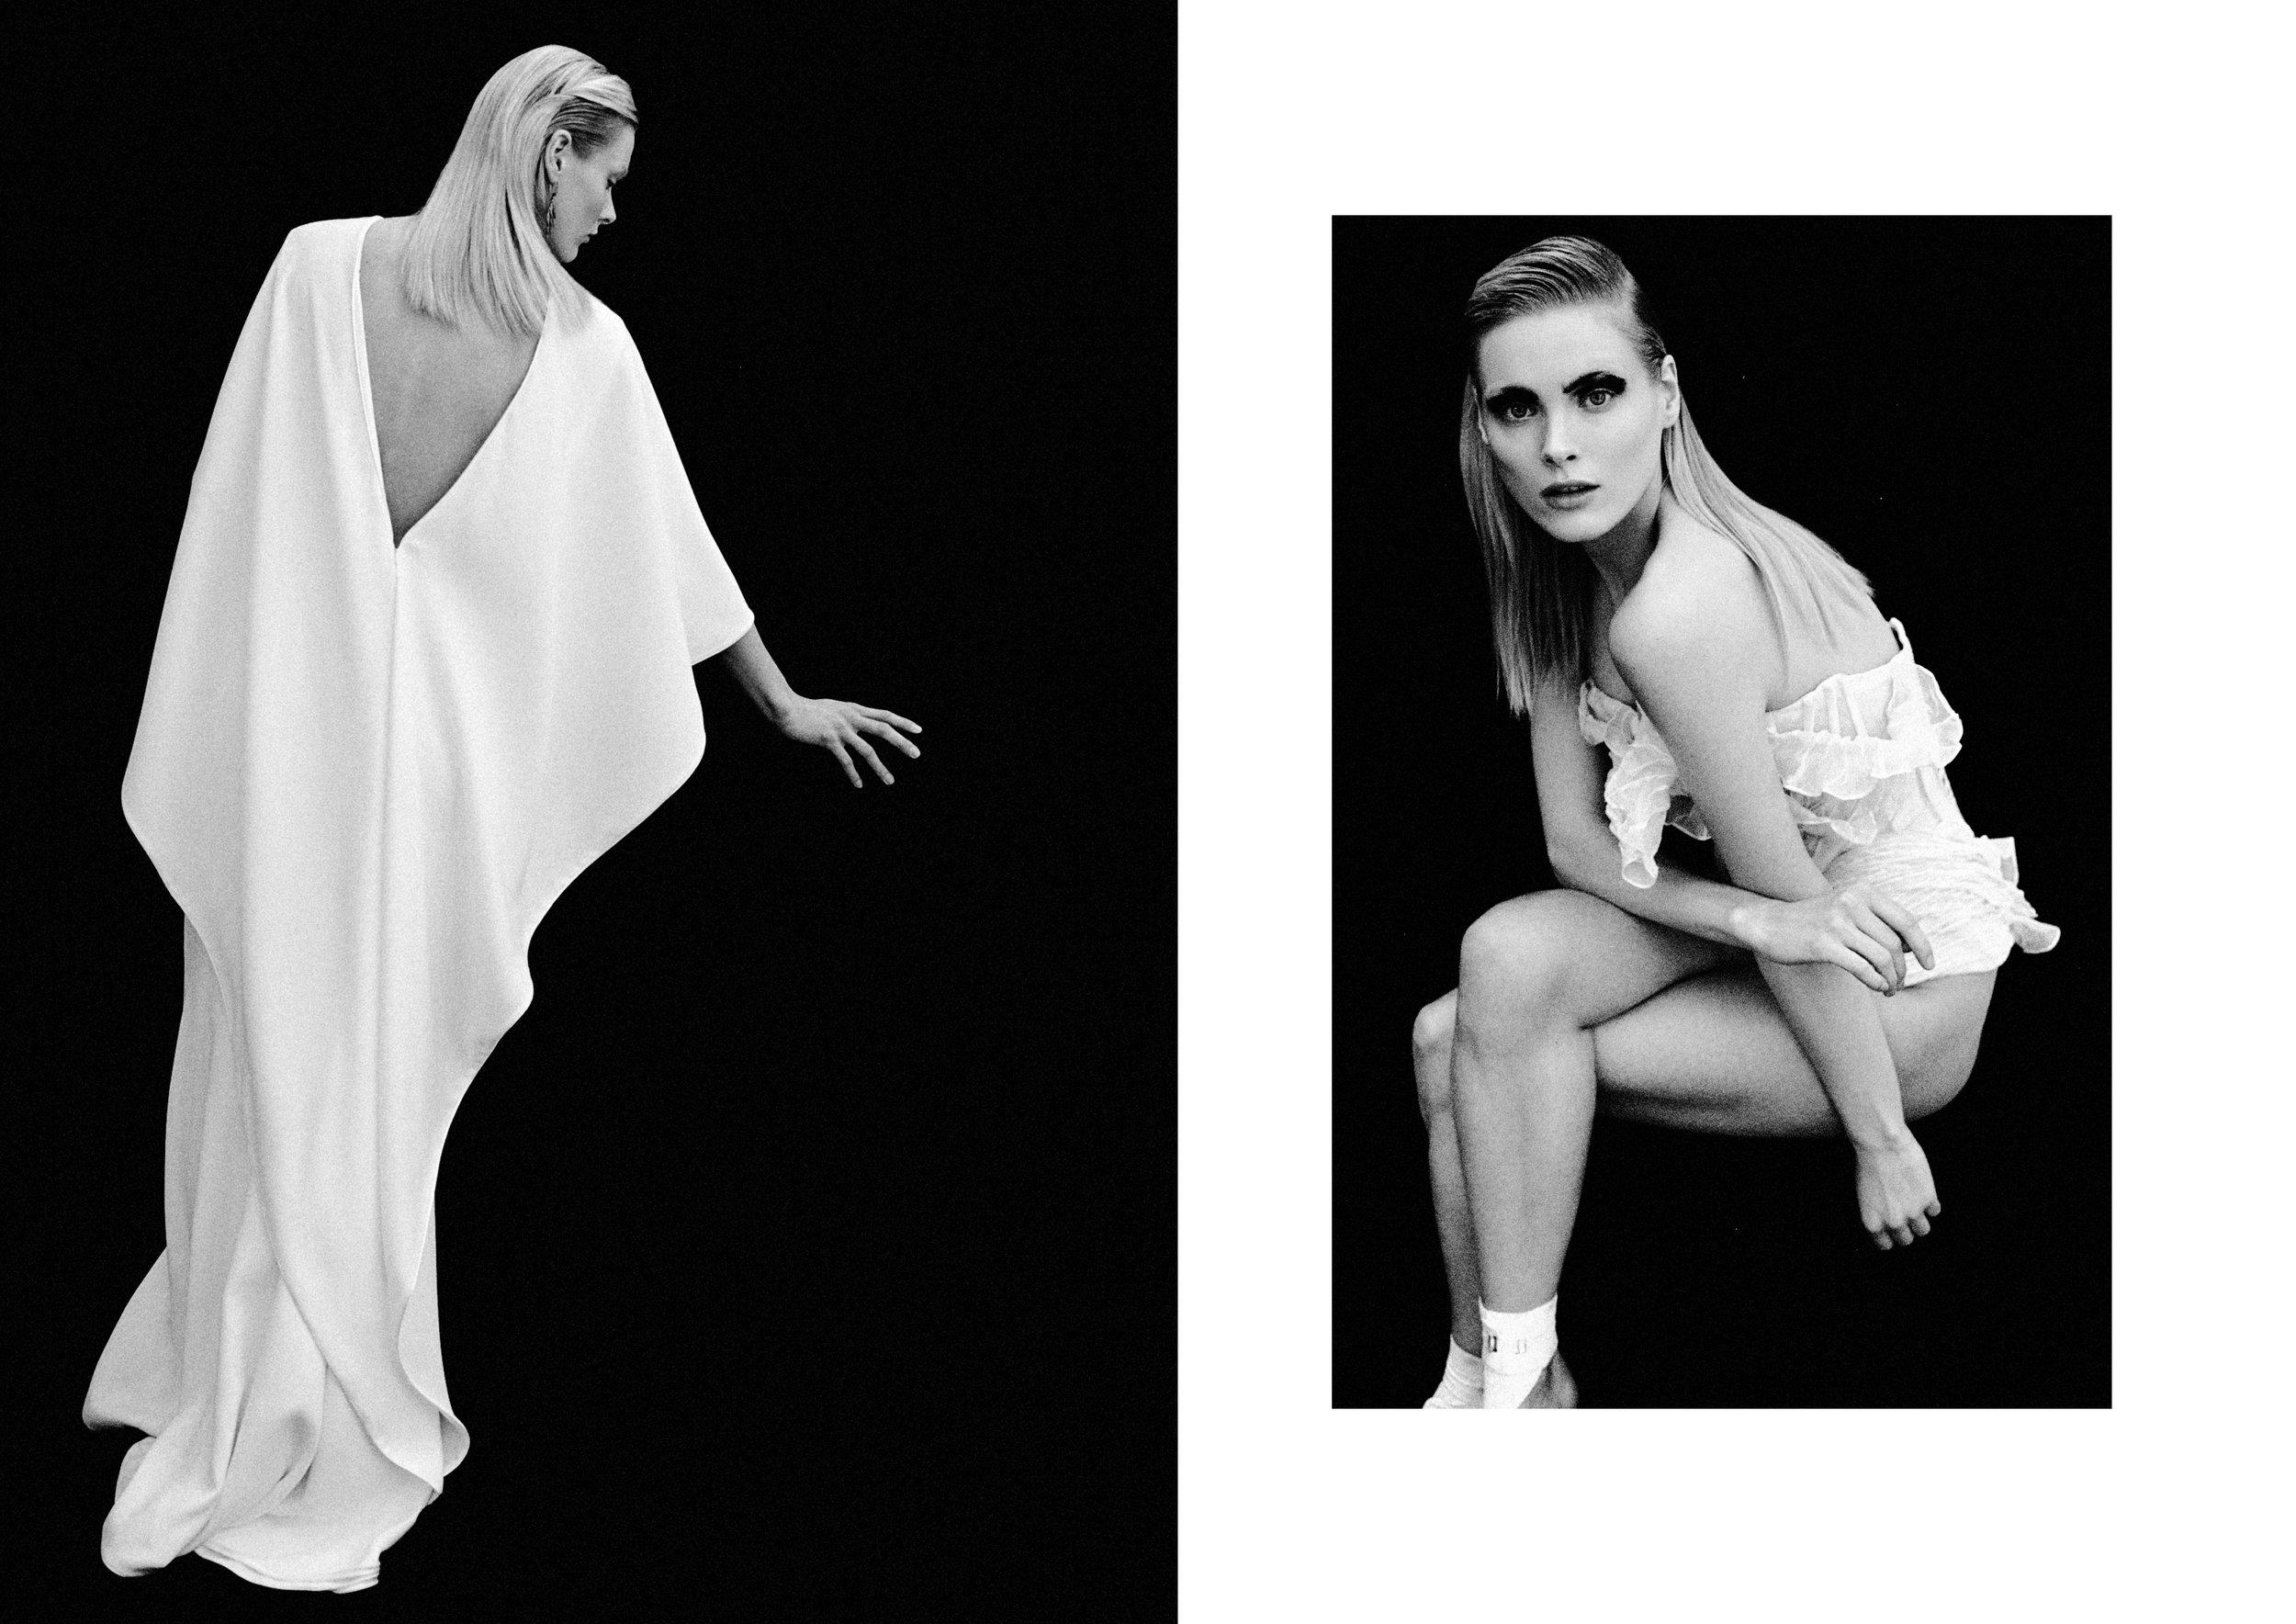 White Swan by Cristian Davila Hernandez_04.jpg